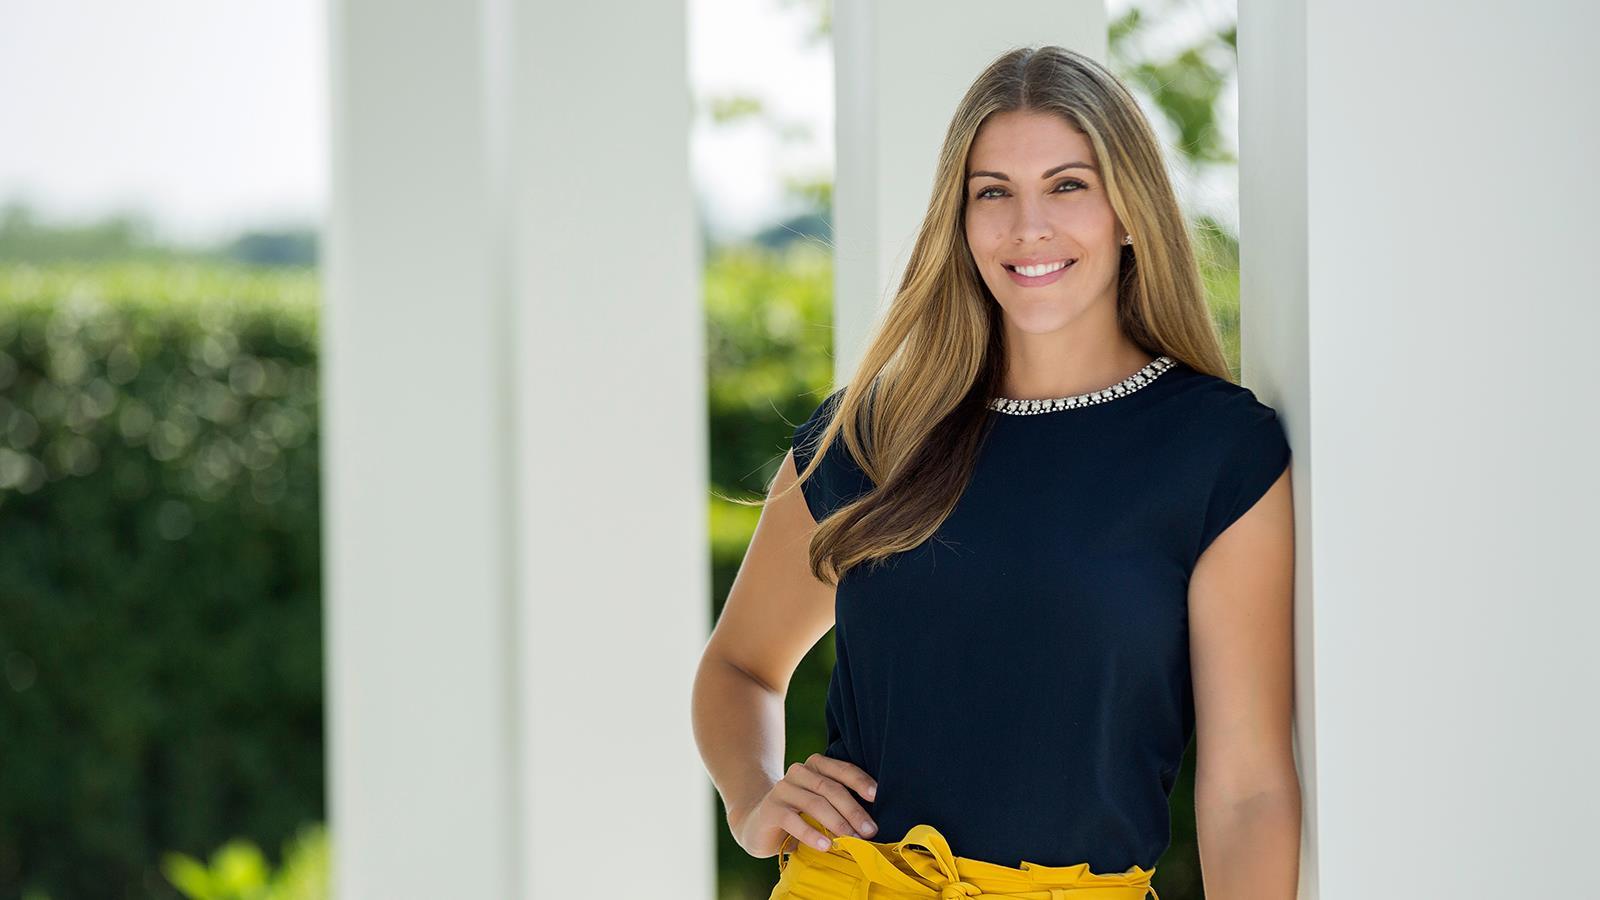 Danielle Lohr